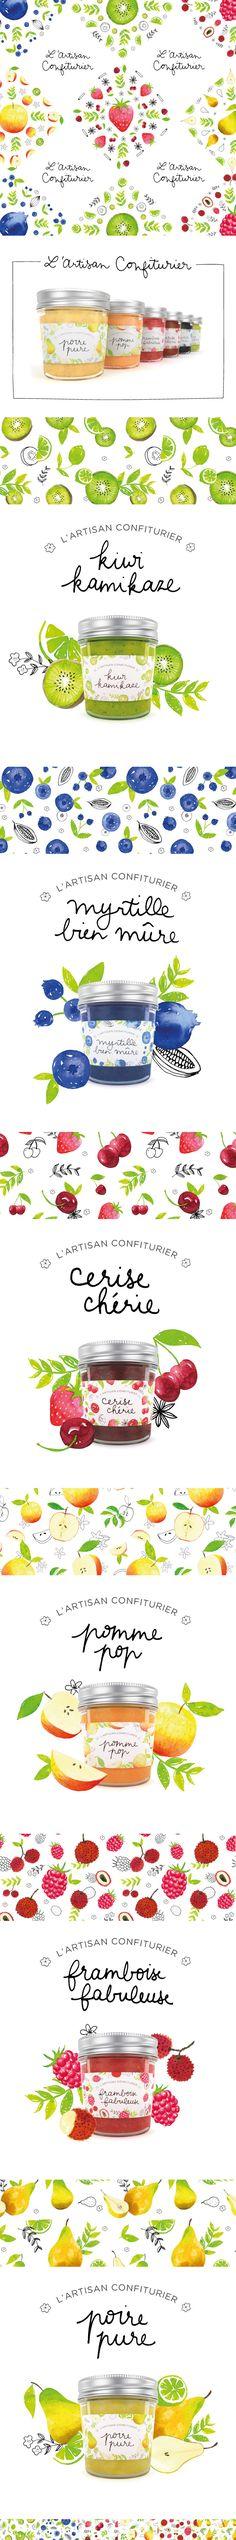 L'Artisan Confiturier - Illustrated Marmelade Packaging on Behance